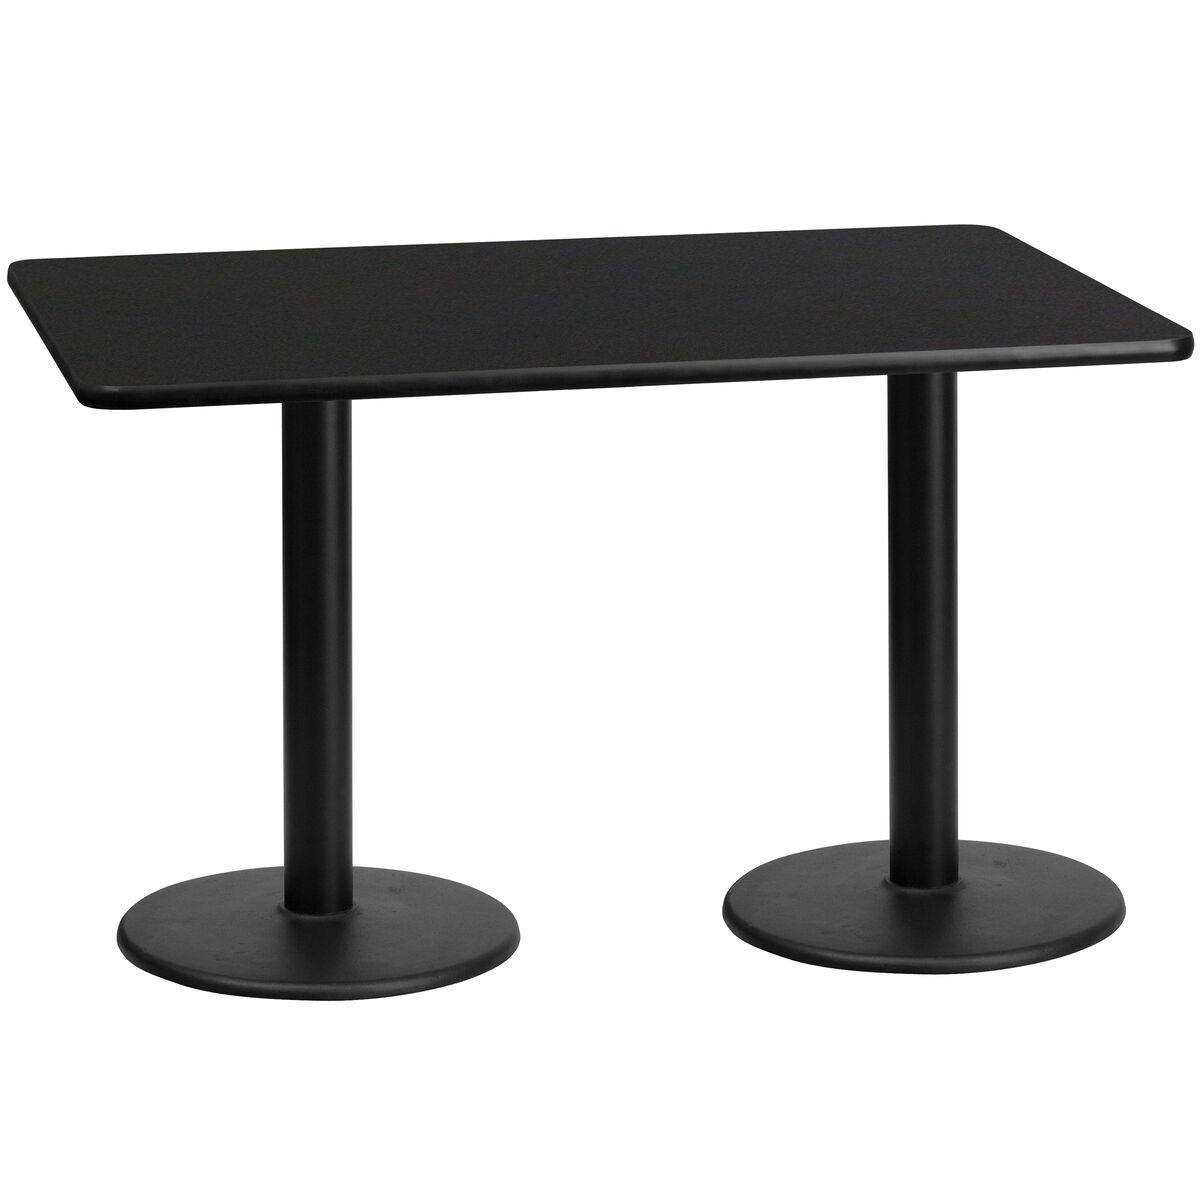 30 X 60 Rectangular Black Laminate Table Top With 18